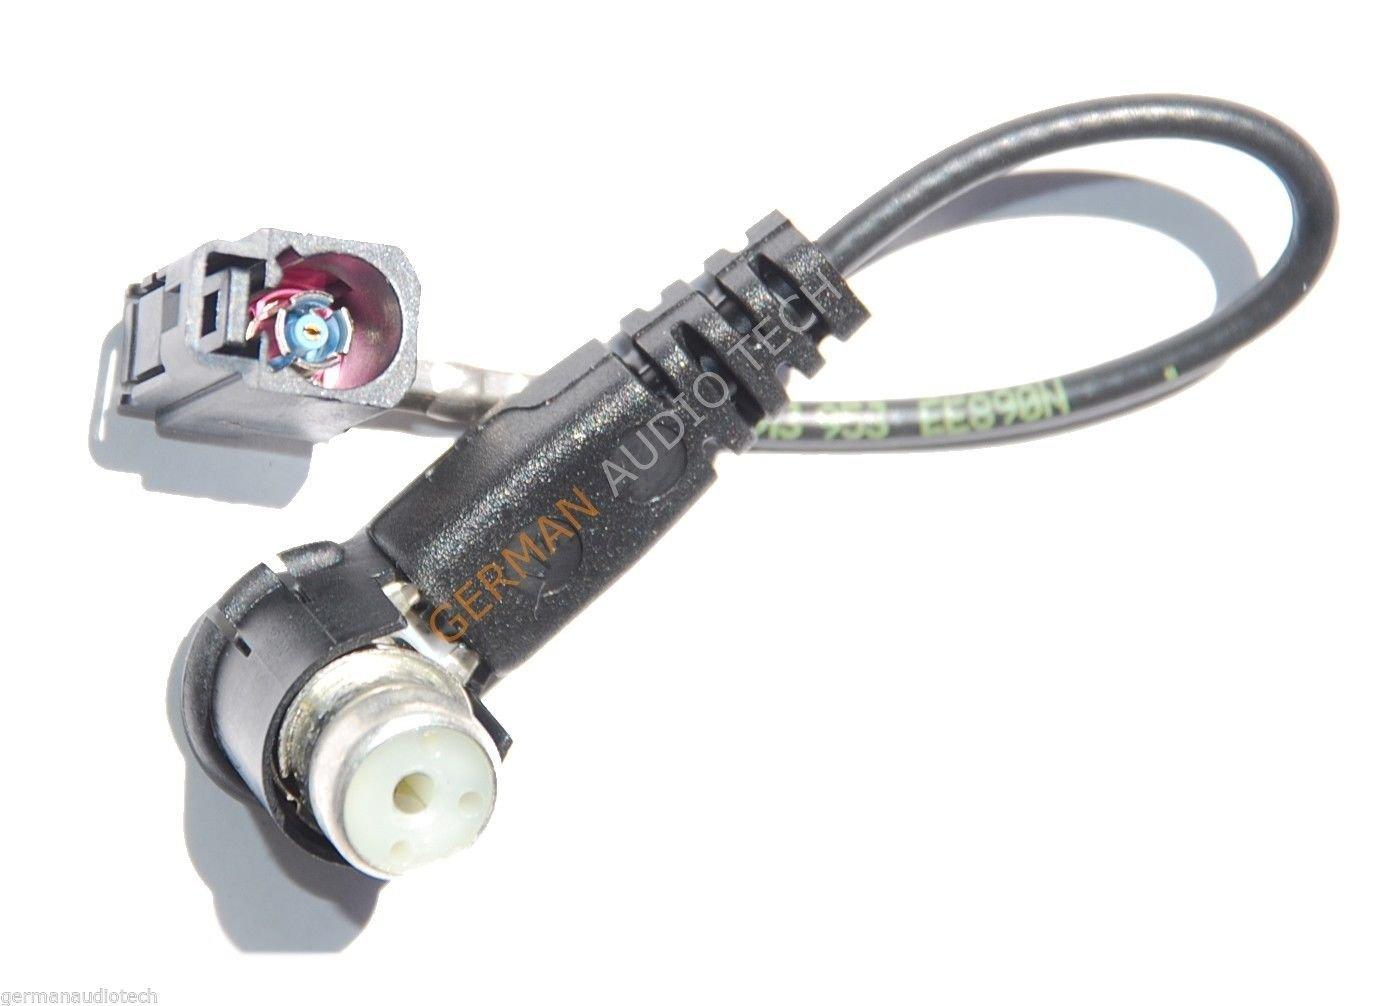 hight resolution of bmw radio antenna adapter harness cable for business cd player mini r50 r52 e46 323i 325i 328i 330i m3 e39 525i 528i 530i 540i m5 e53 x5 1996 1997 1998 1999